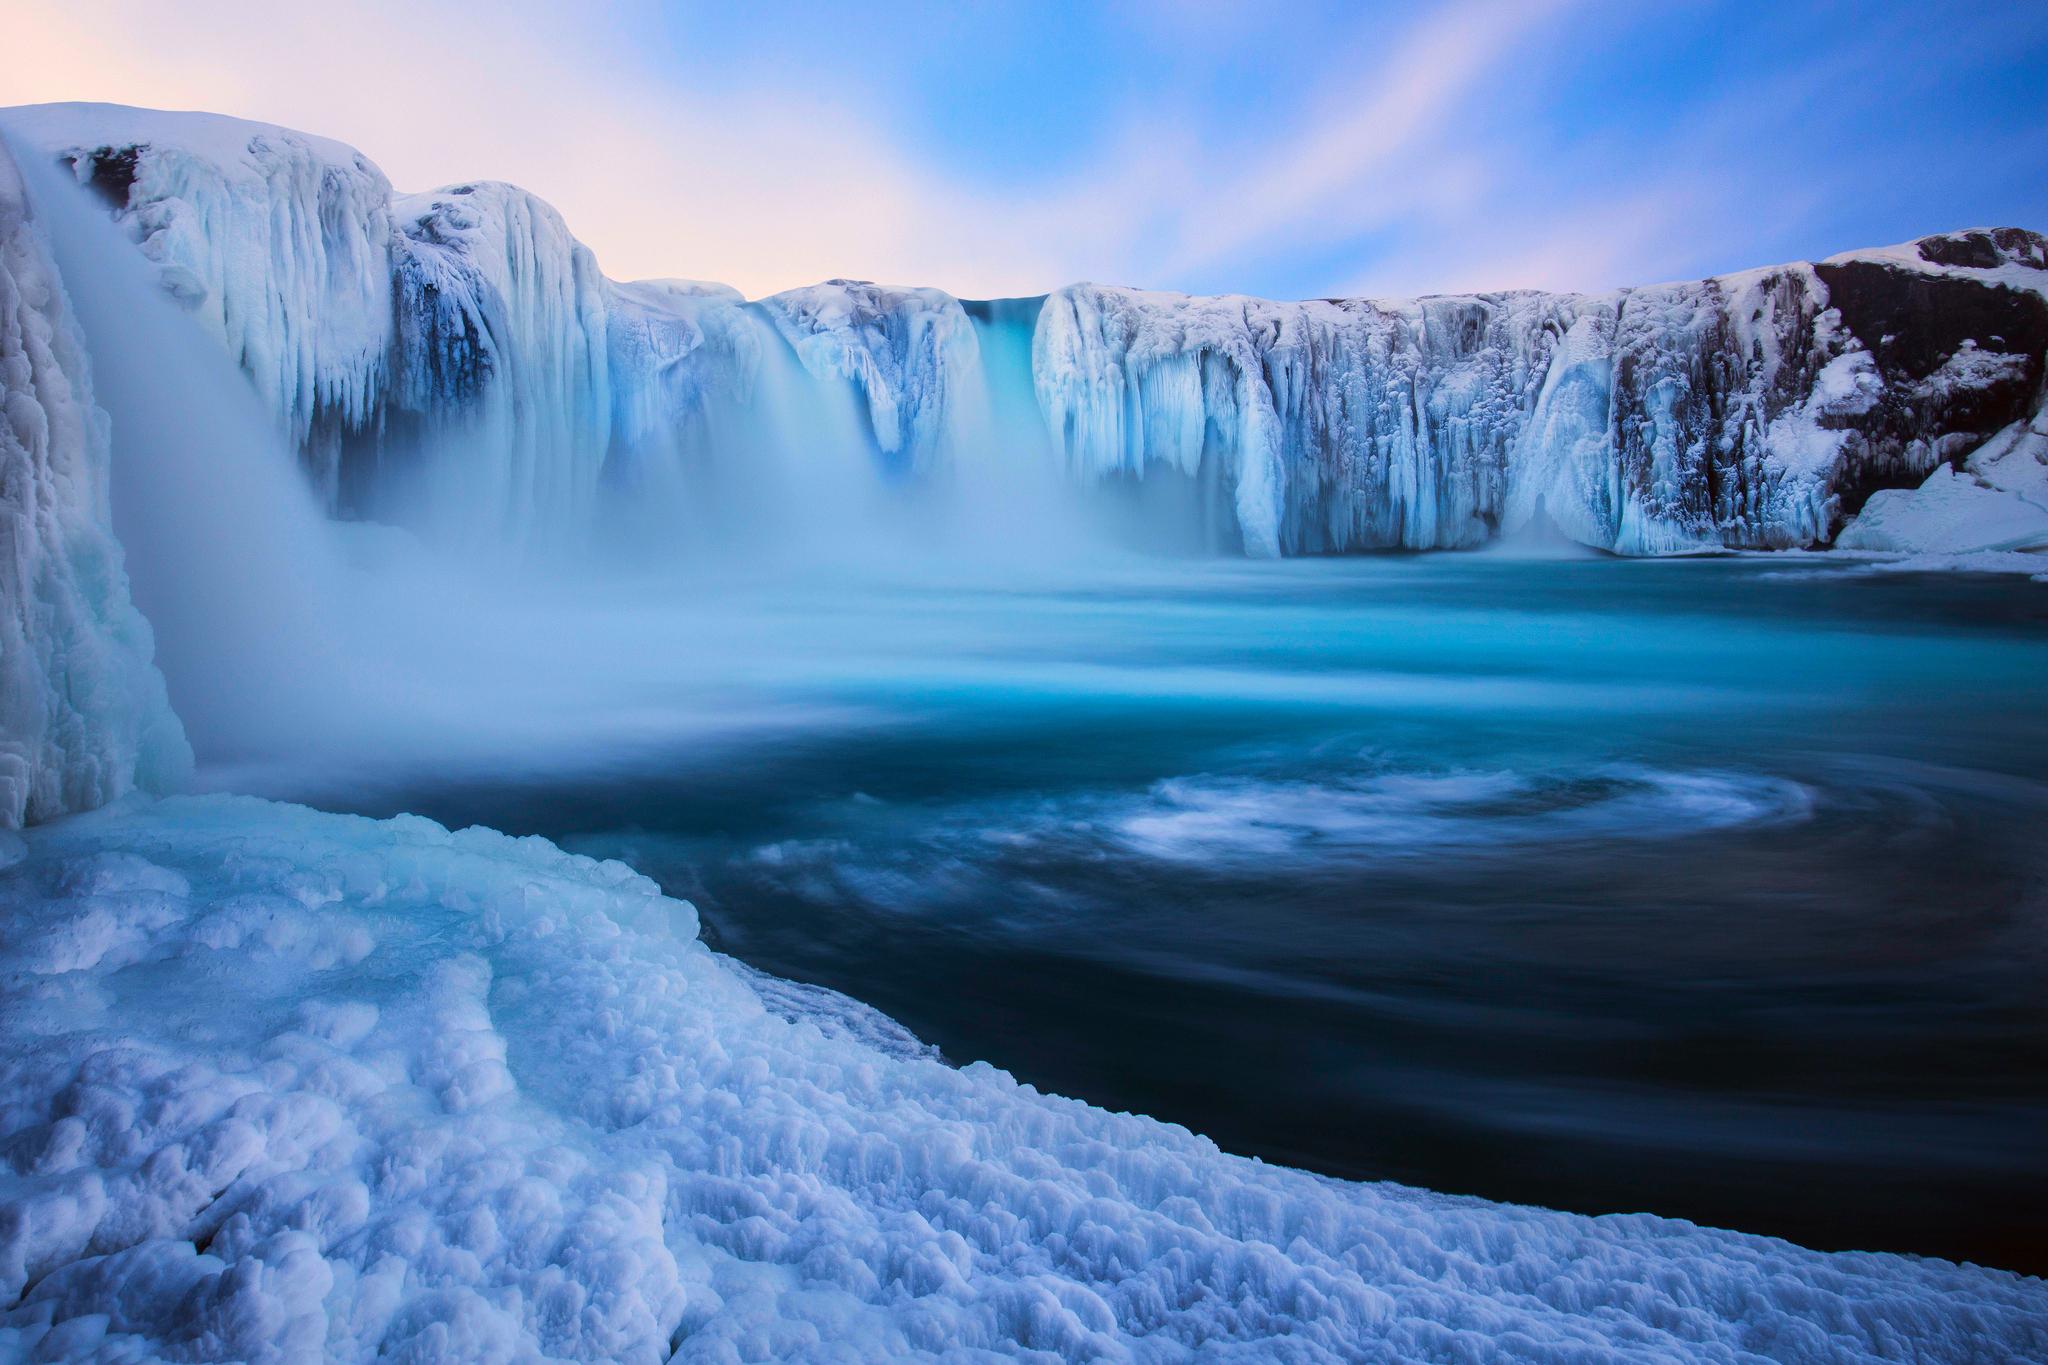 Зимний водопад  № 2946866  скачать